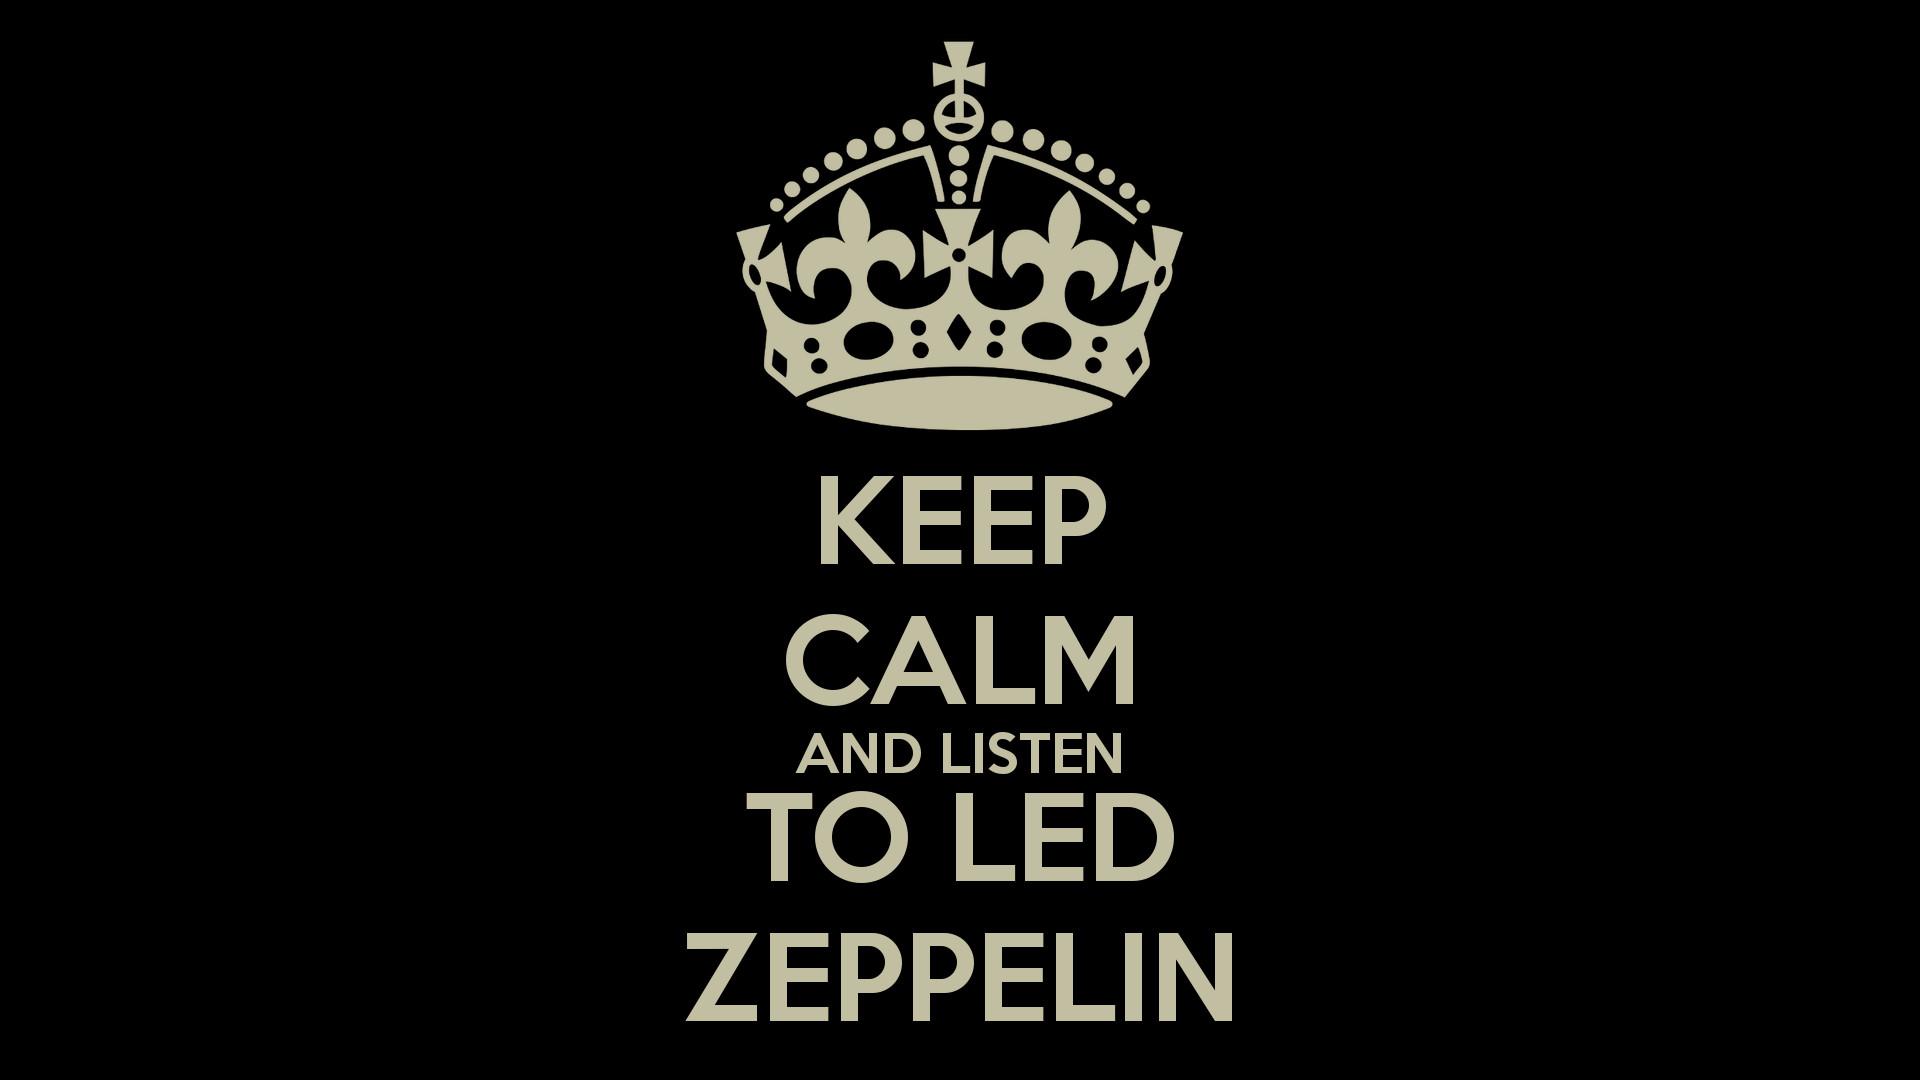 Cool Backgrounds Led Zeppelin